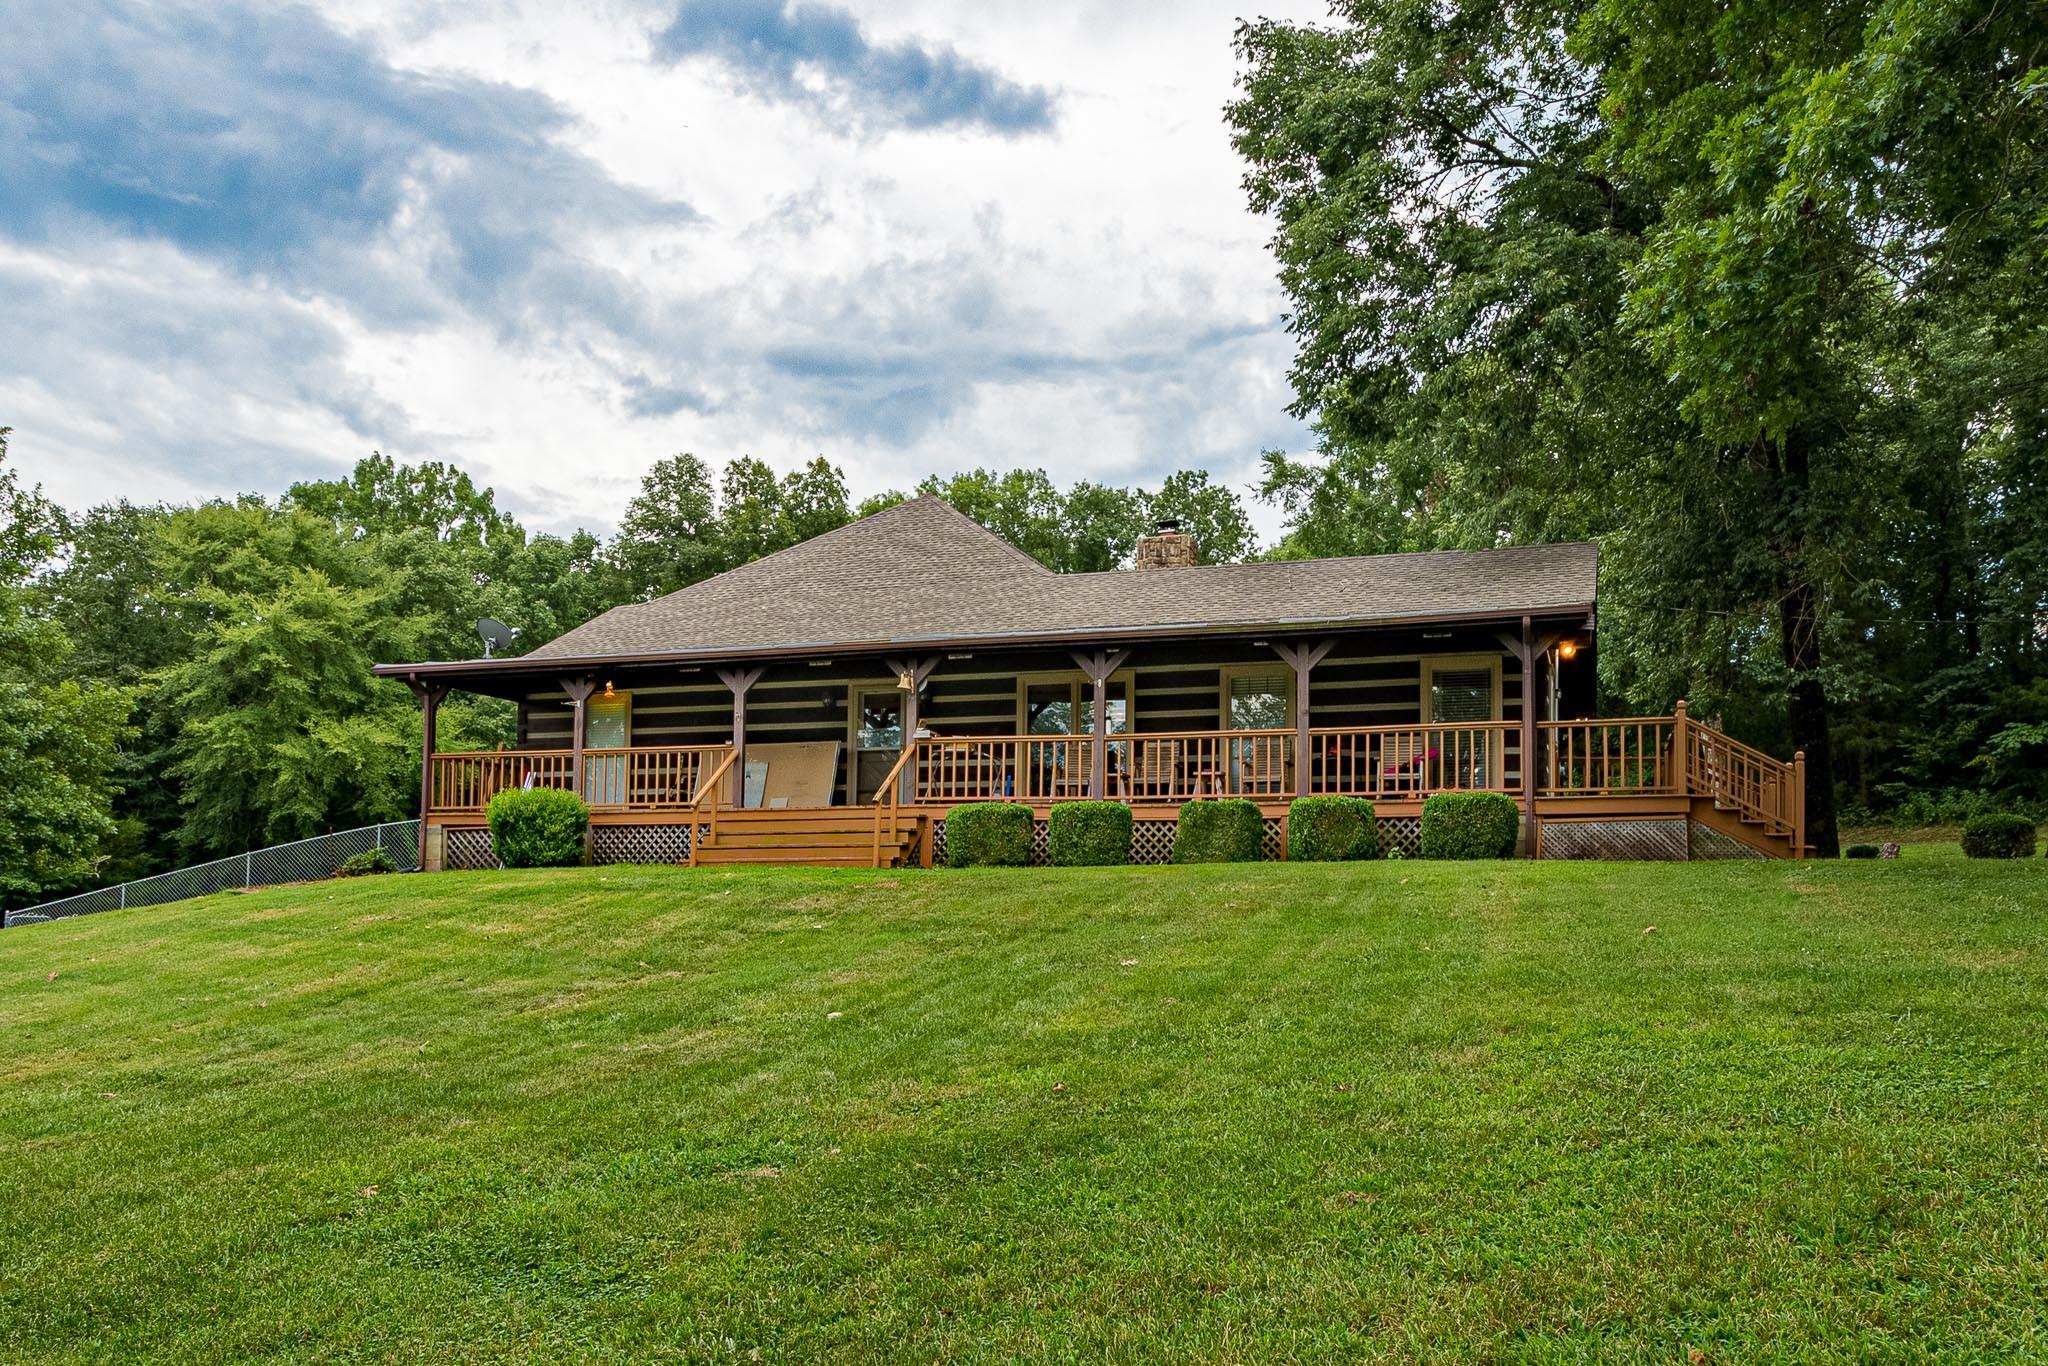 1650 Amos Hamlett Rd, Pulaski, TN 38478 - Pulaski, TN real estate listing